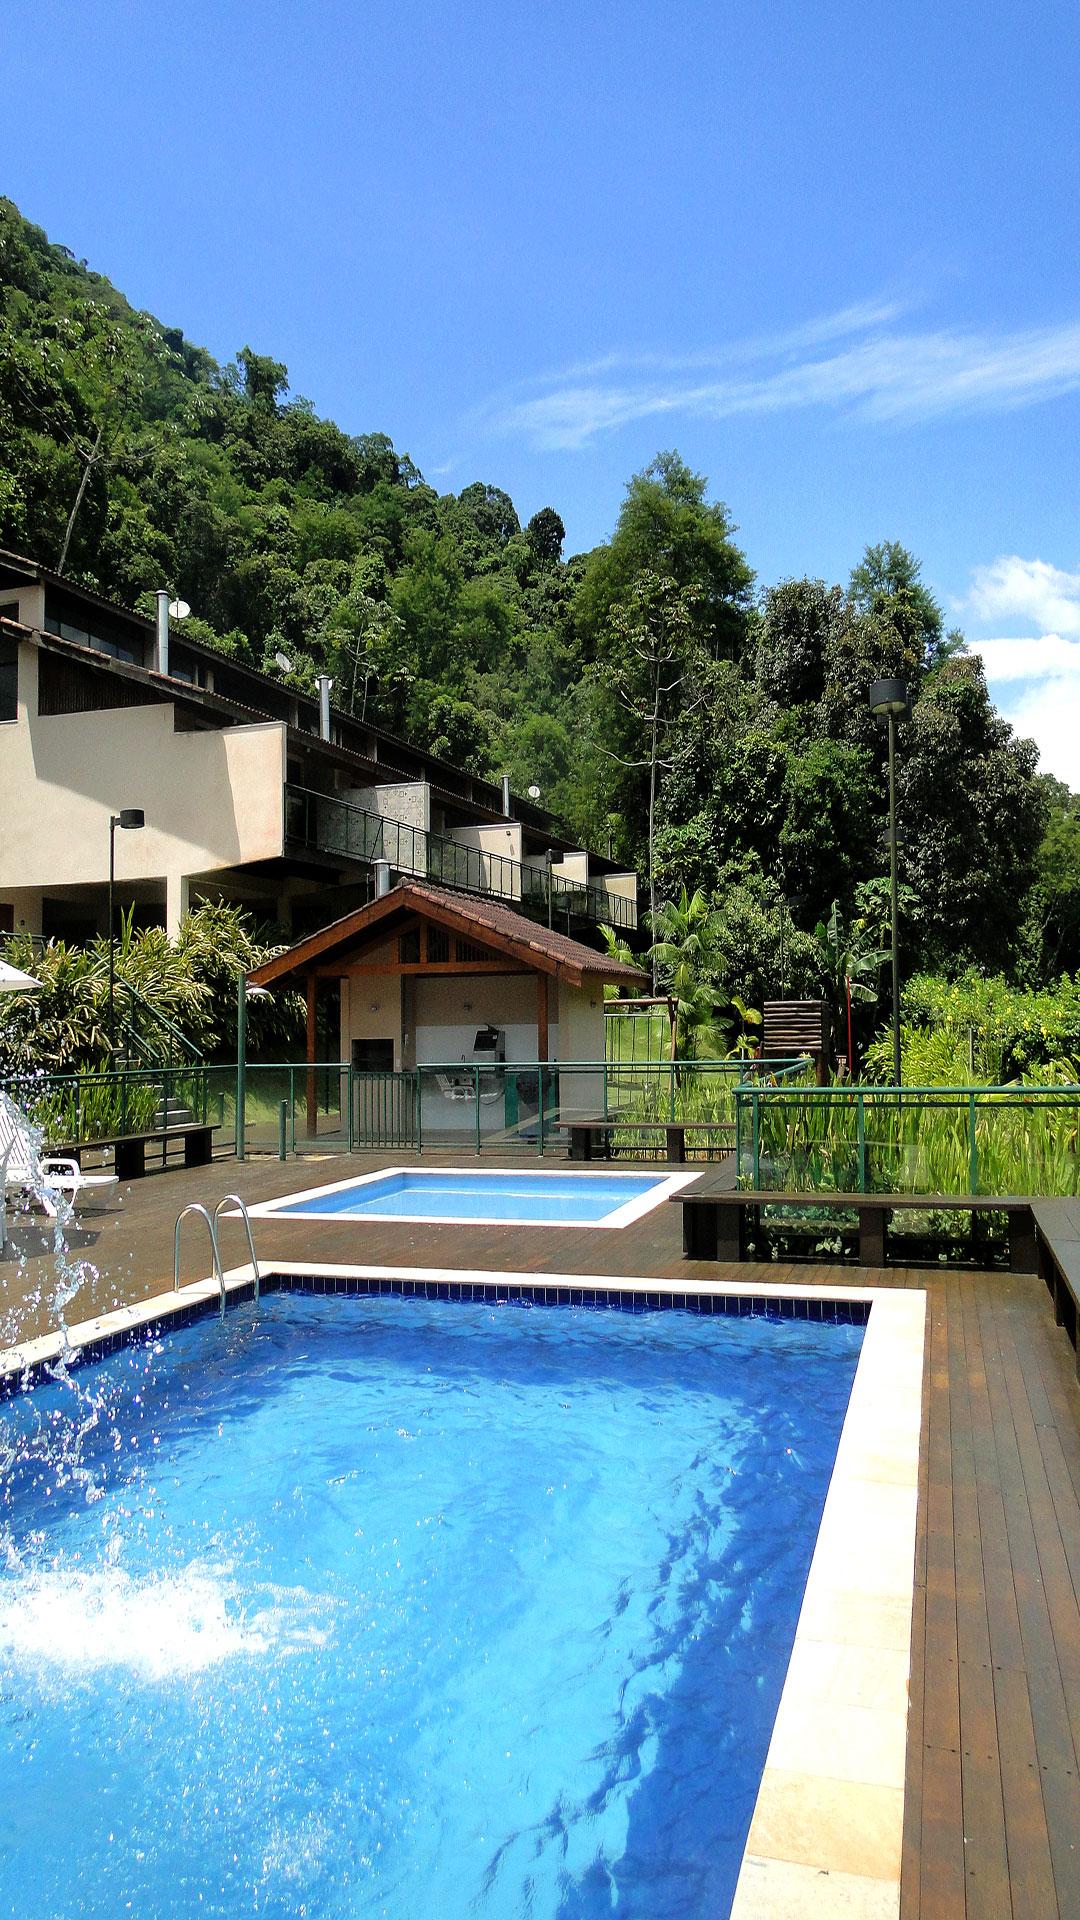 Residencial Fazenda São Paulo - Chemin Engenharia